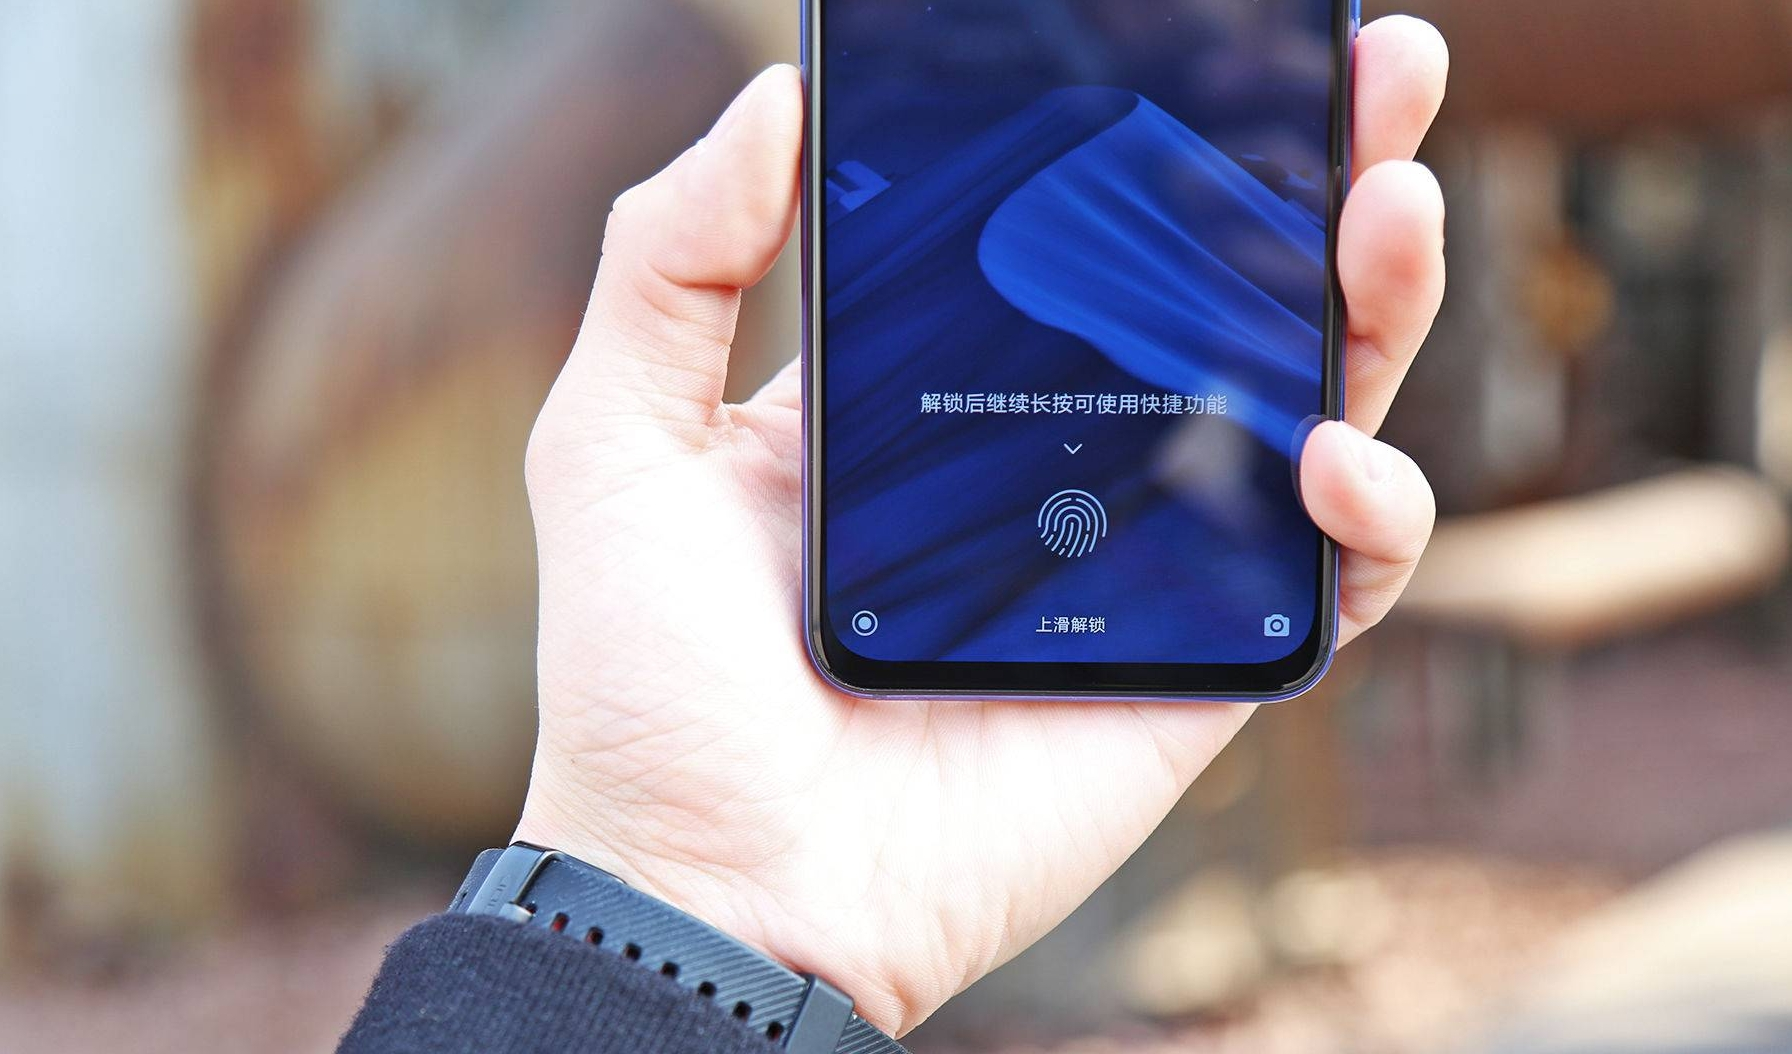 Xiaomi 9 SE fingerprint on screen